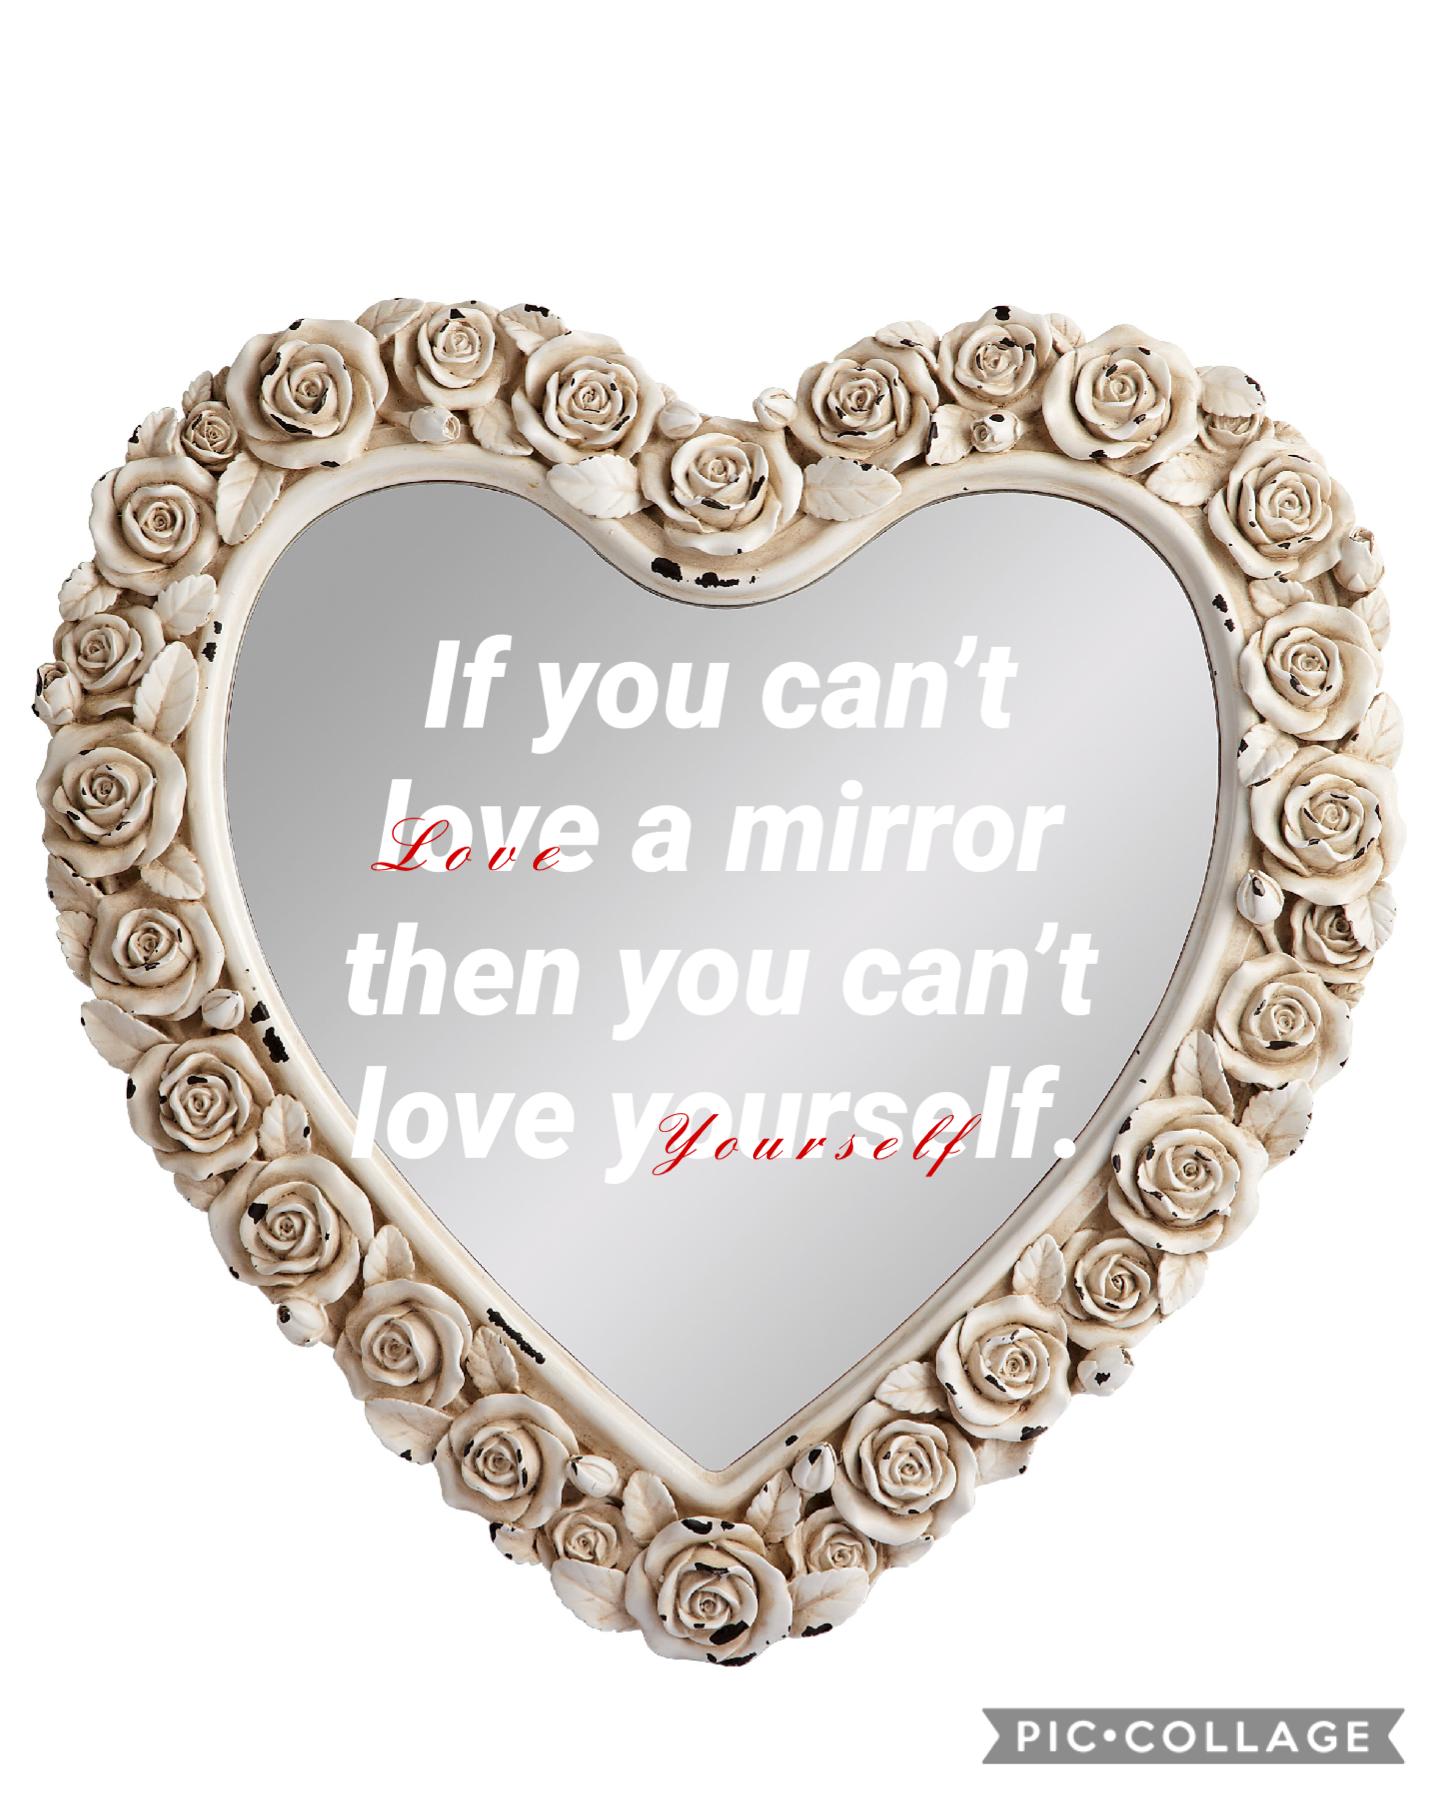 Please love yourself! 05/01/21